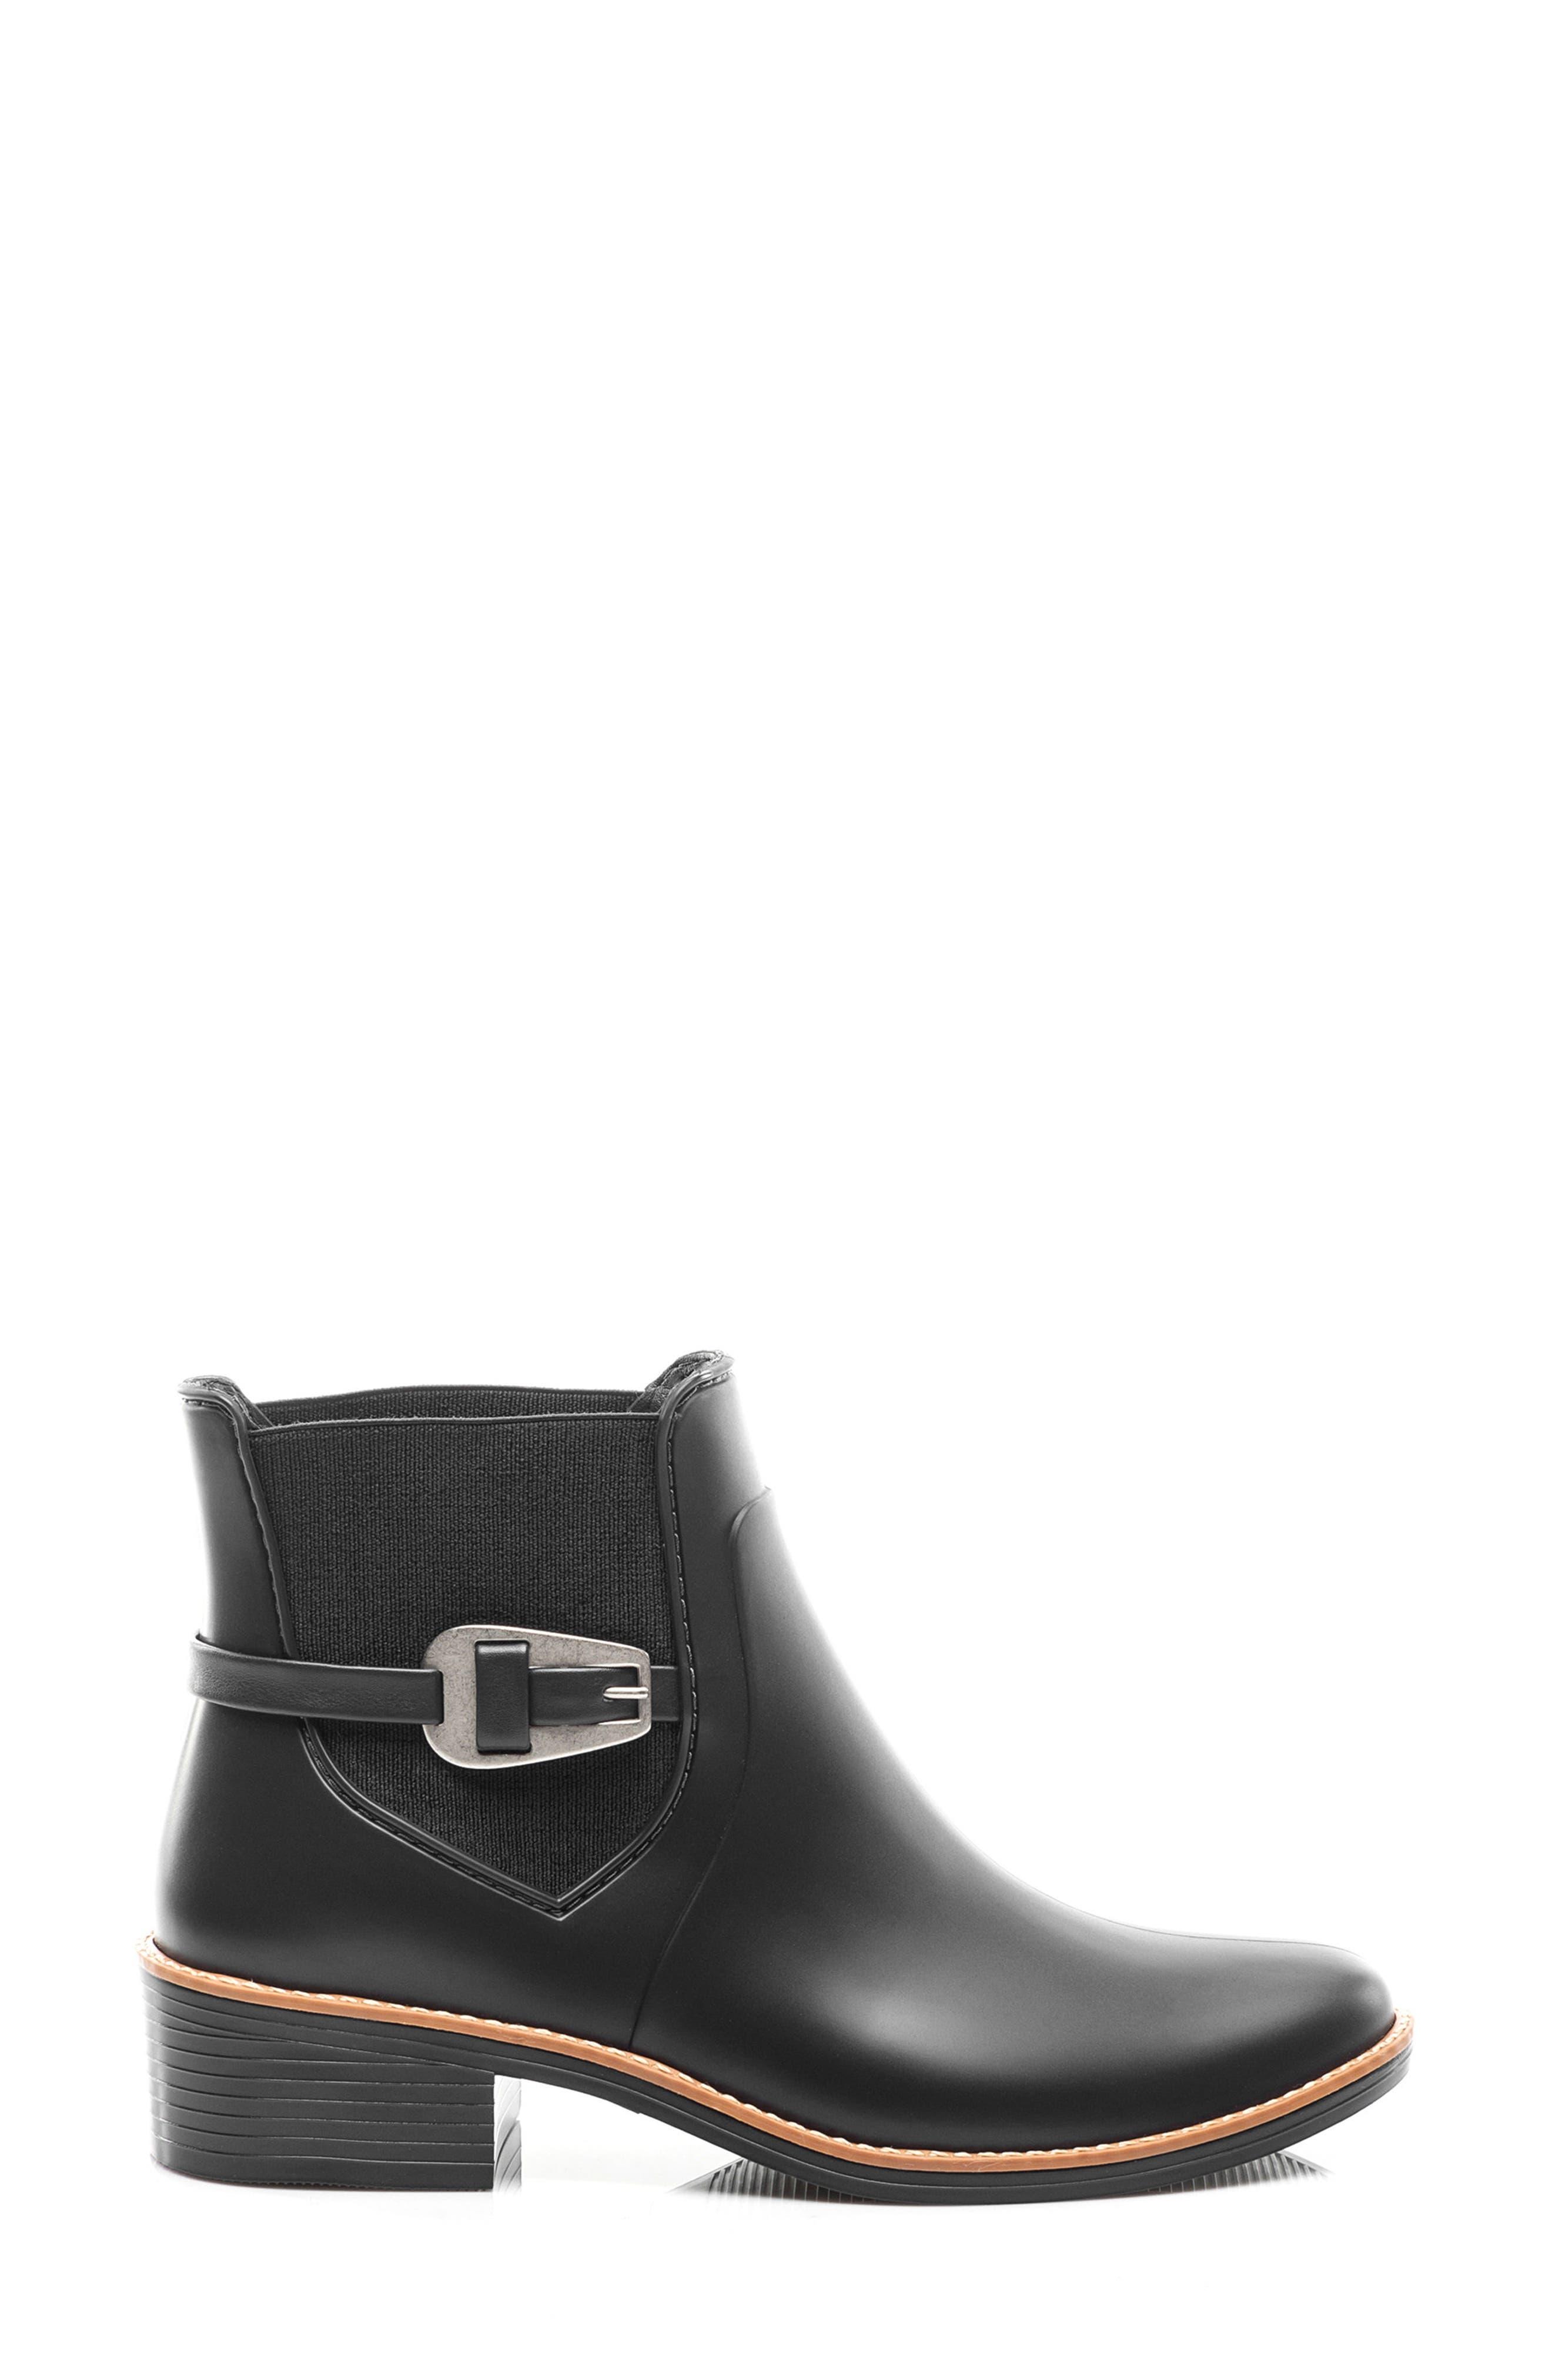 Alternate Image 3  - Bernardo Footwear Pansie Rain Boot (Women)